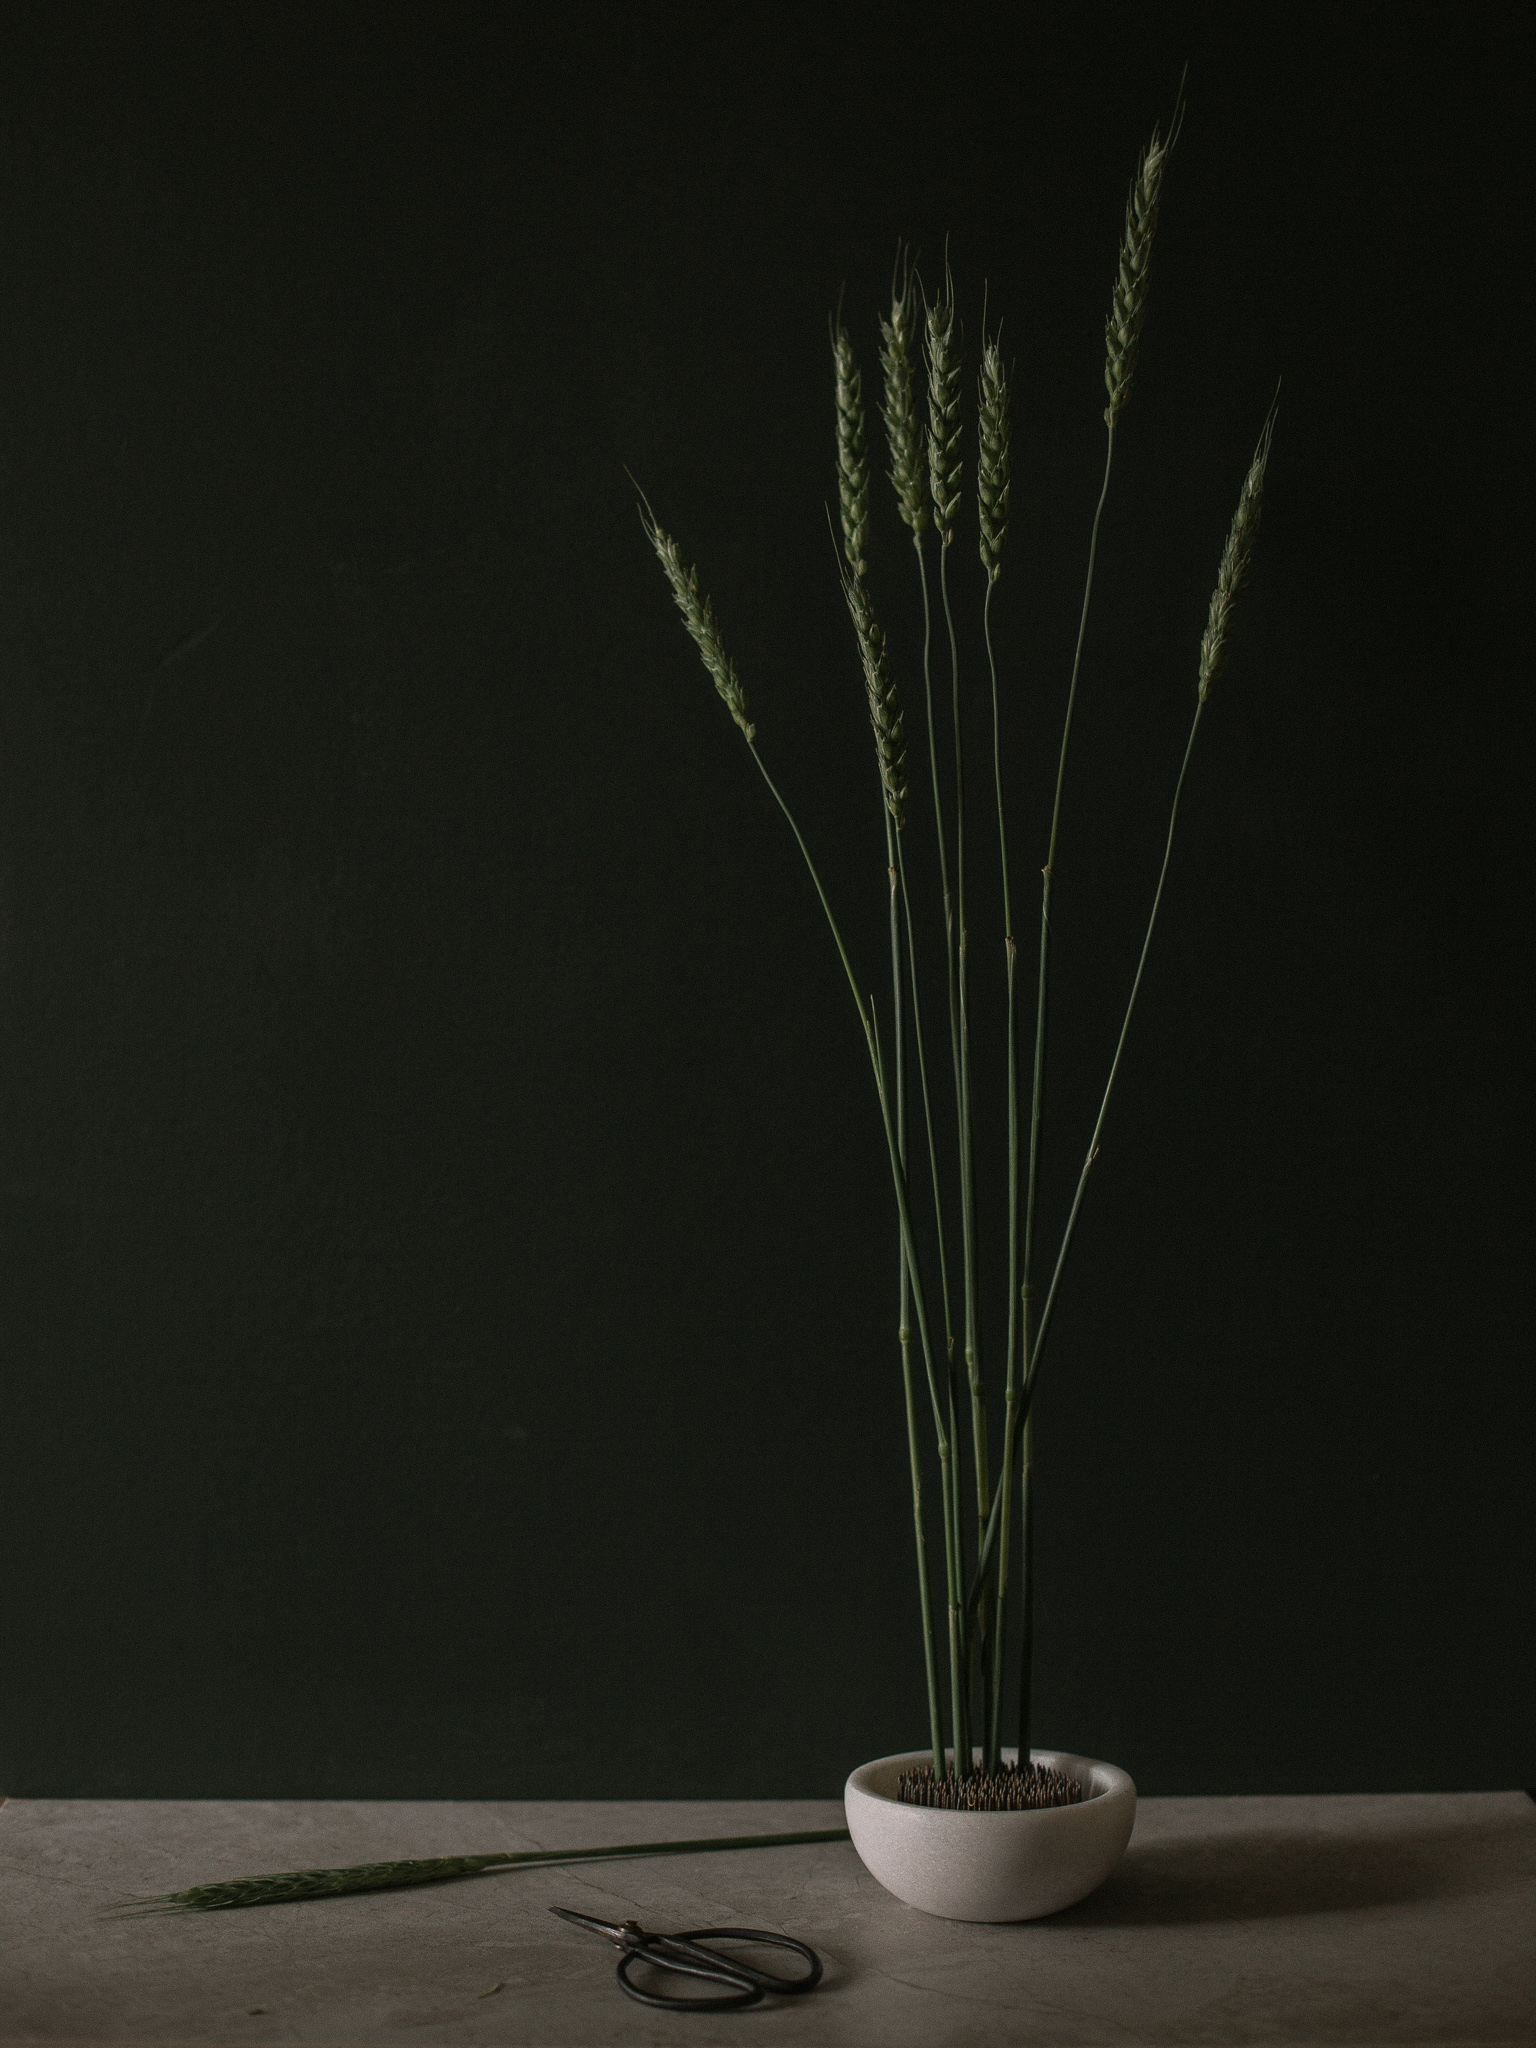 Wheat by Danielle Sabol | daniellemsabol.com